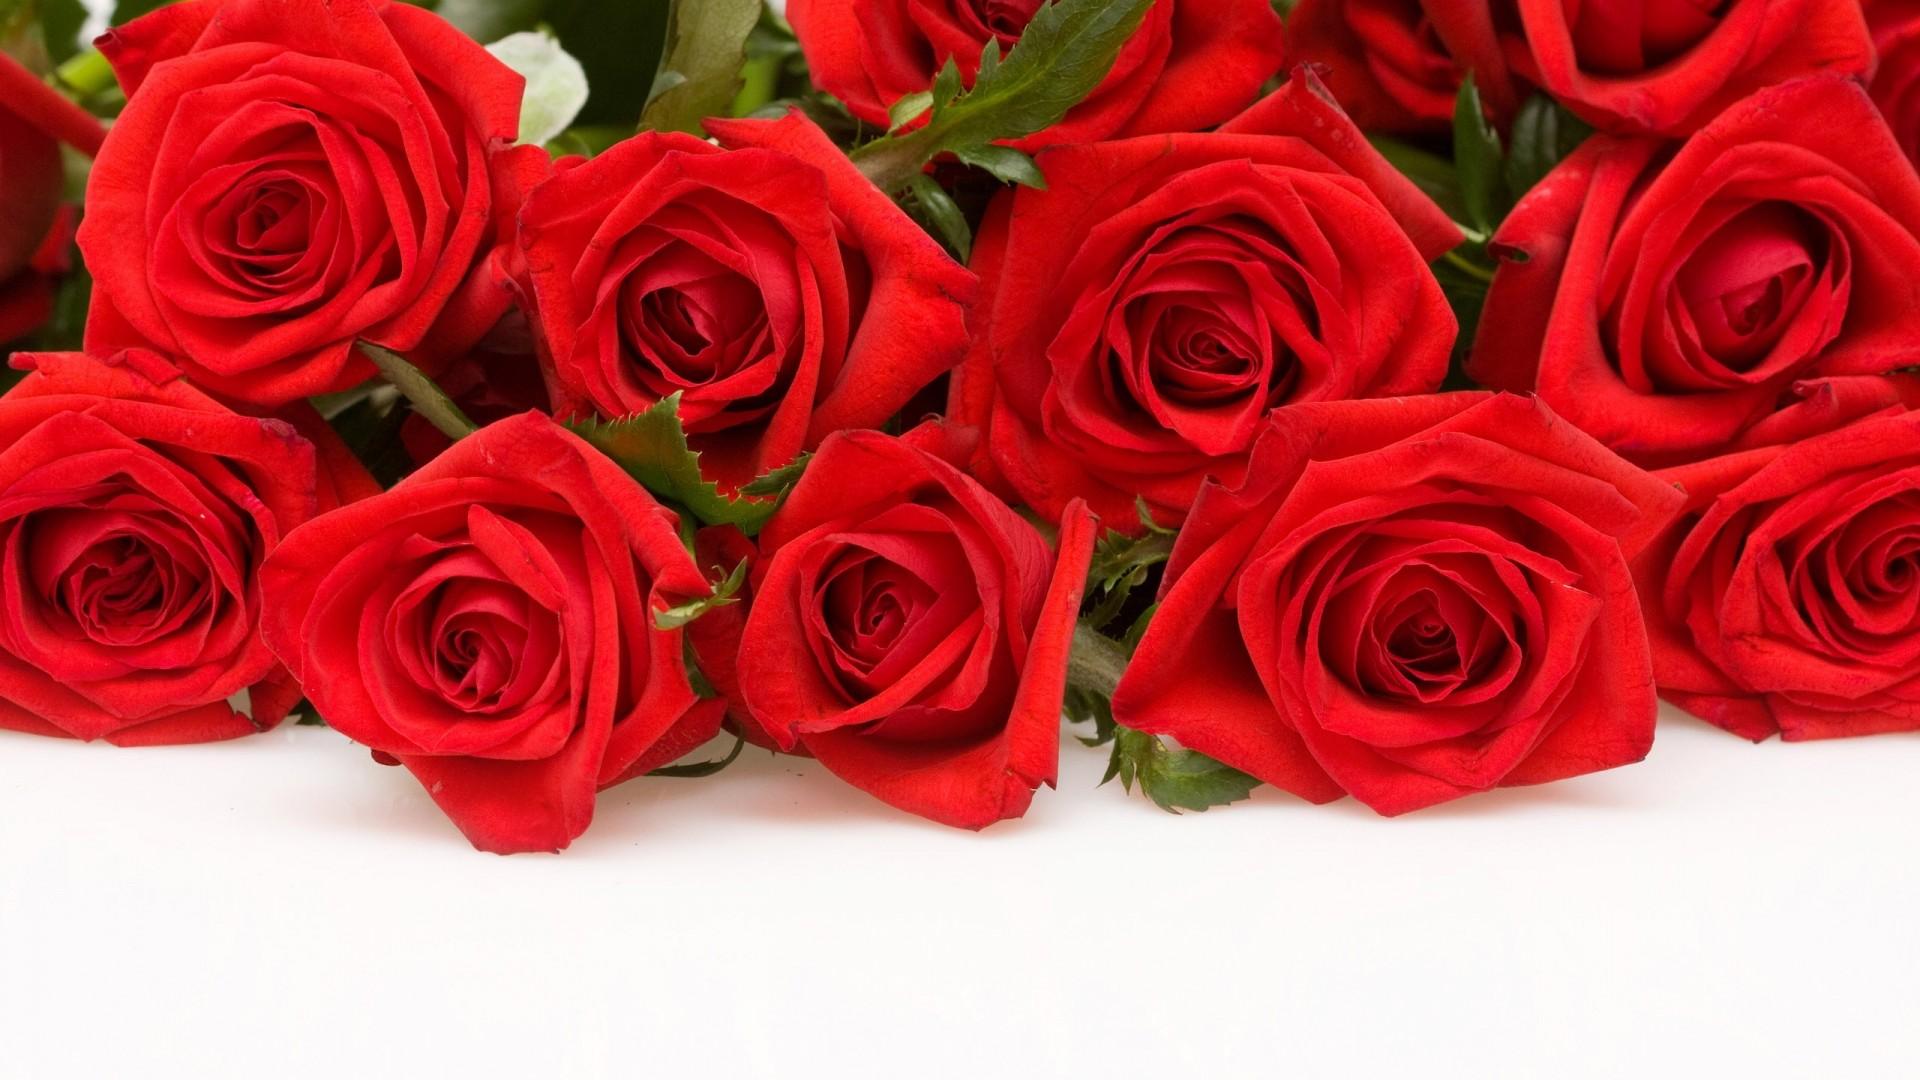 Full HD 1080p Red Rose Wallpapers